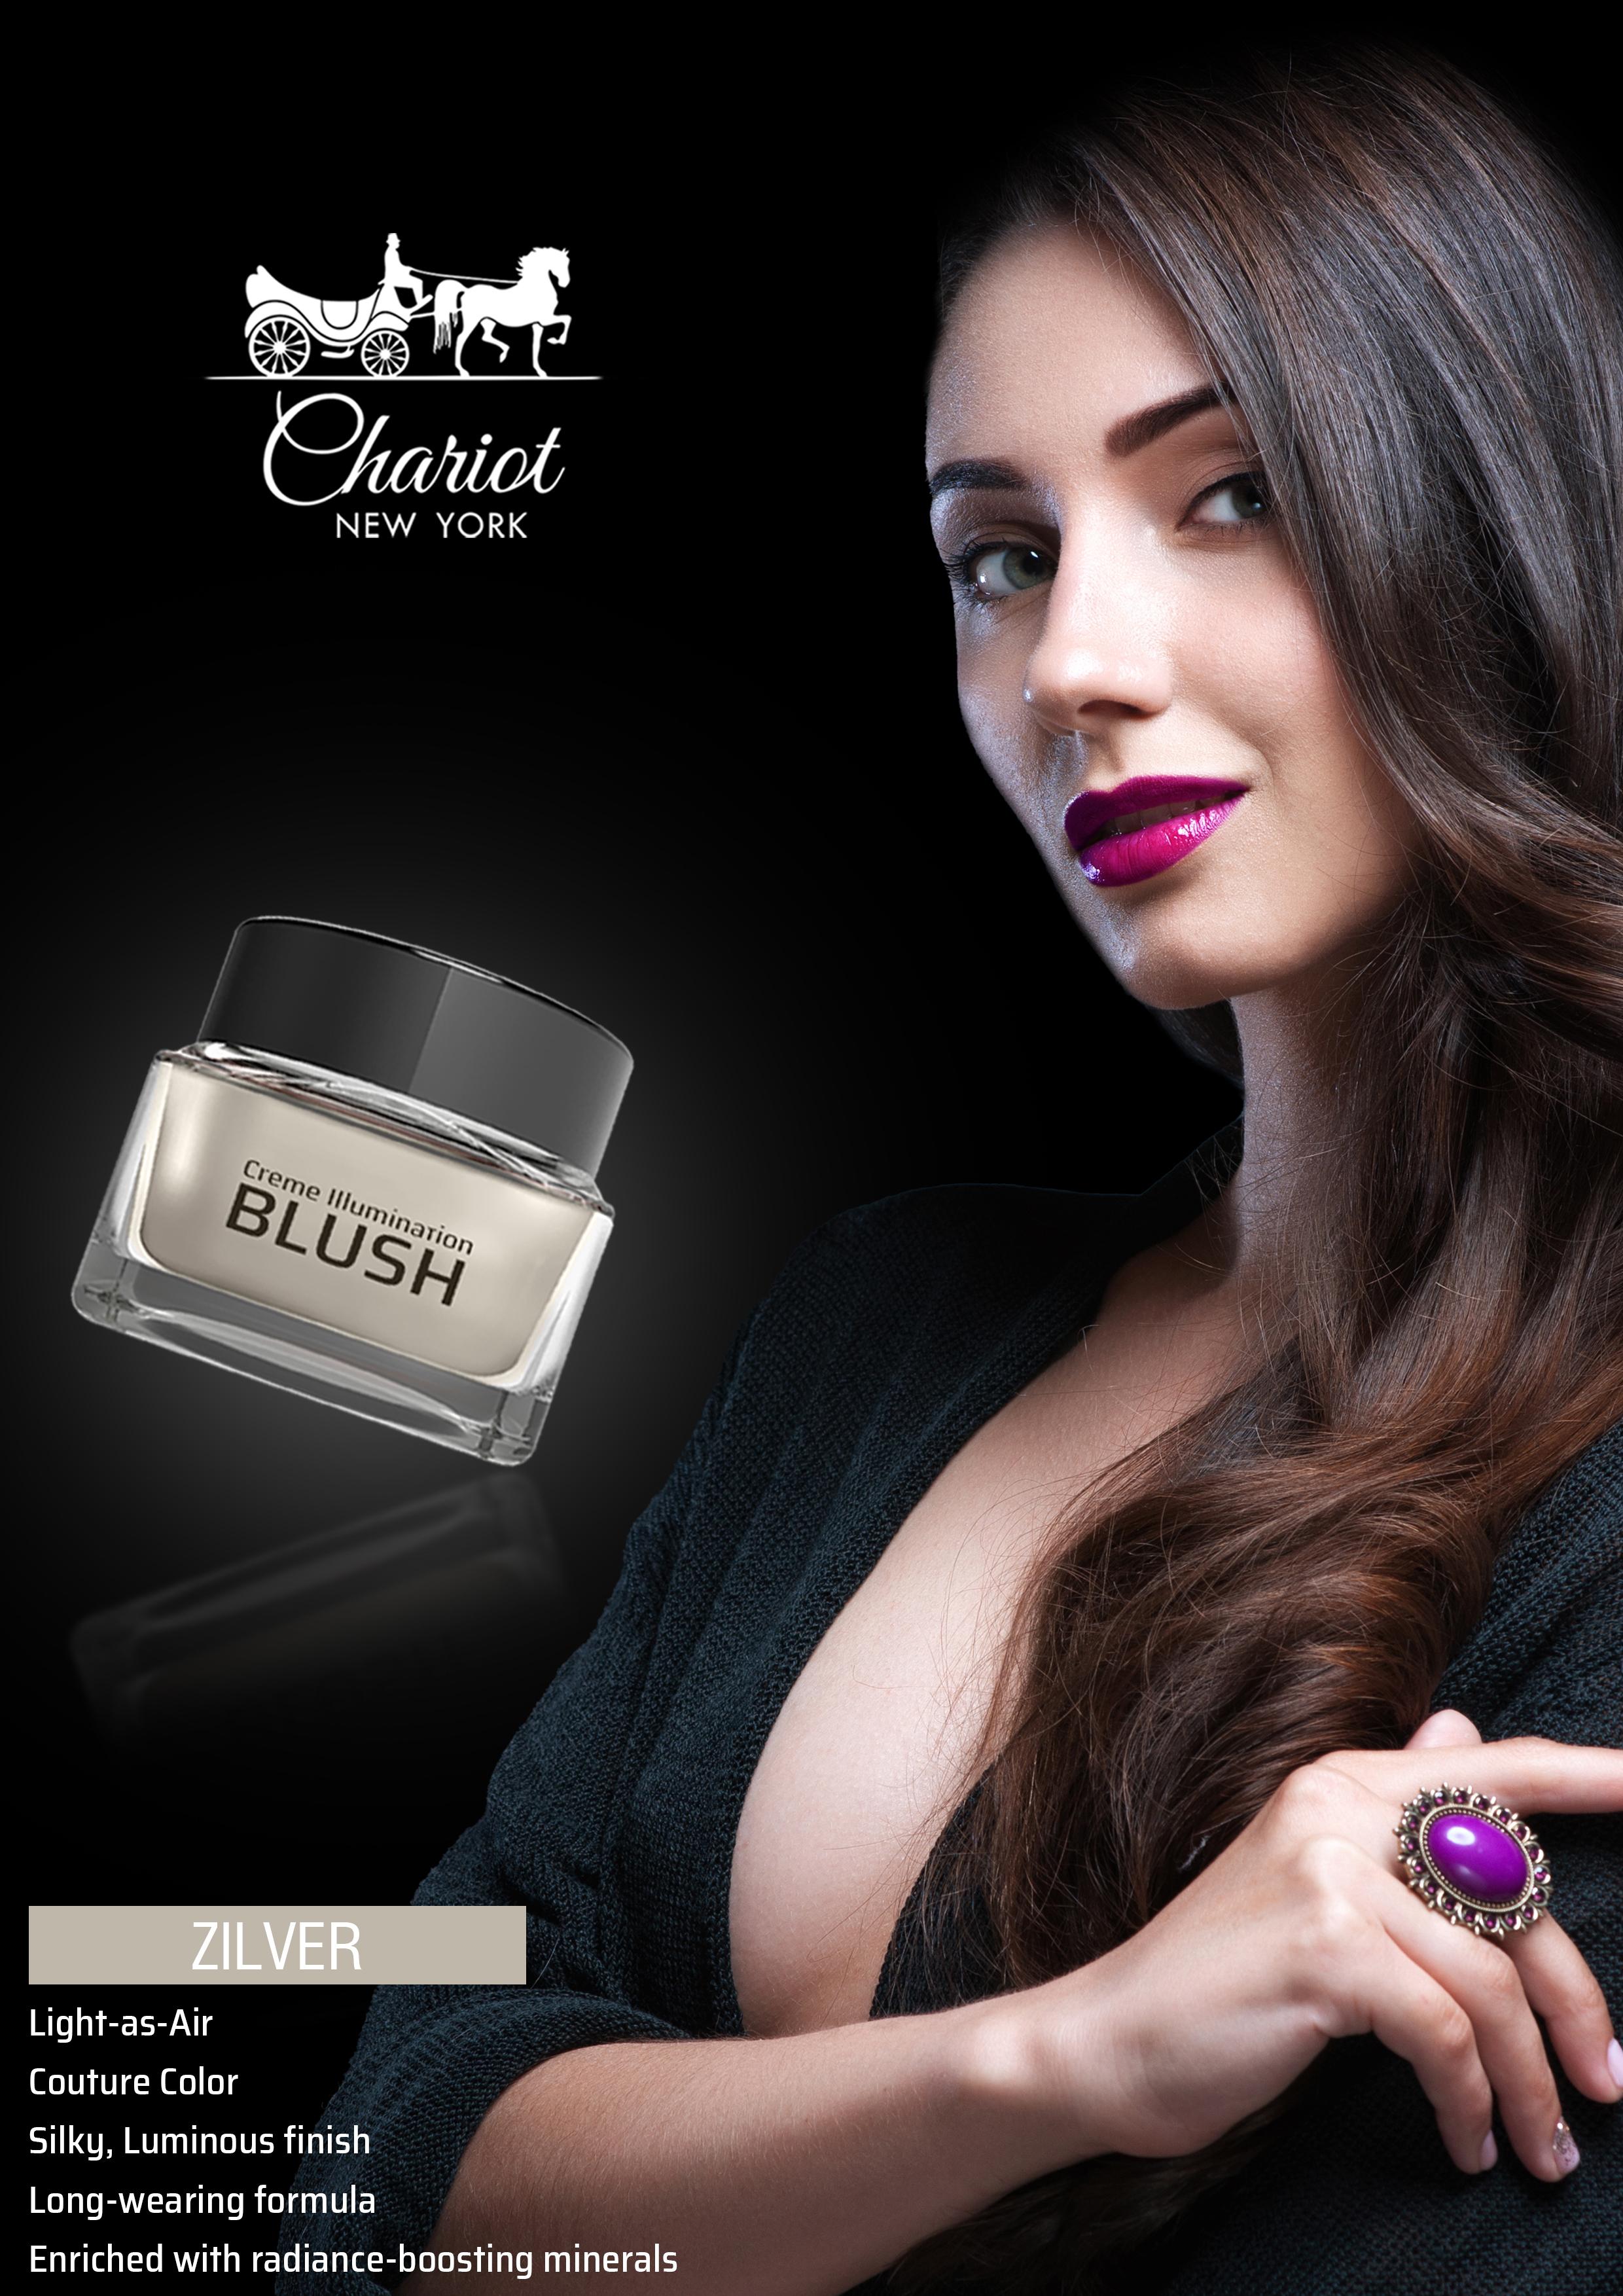 Chariot New York Zilver Shimmer Blush (Silver)